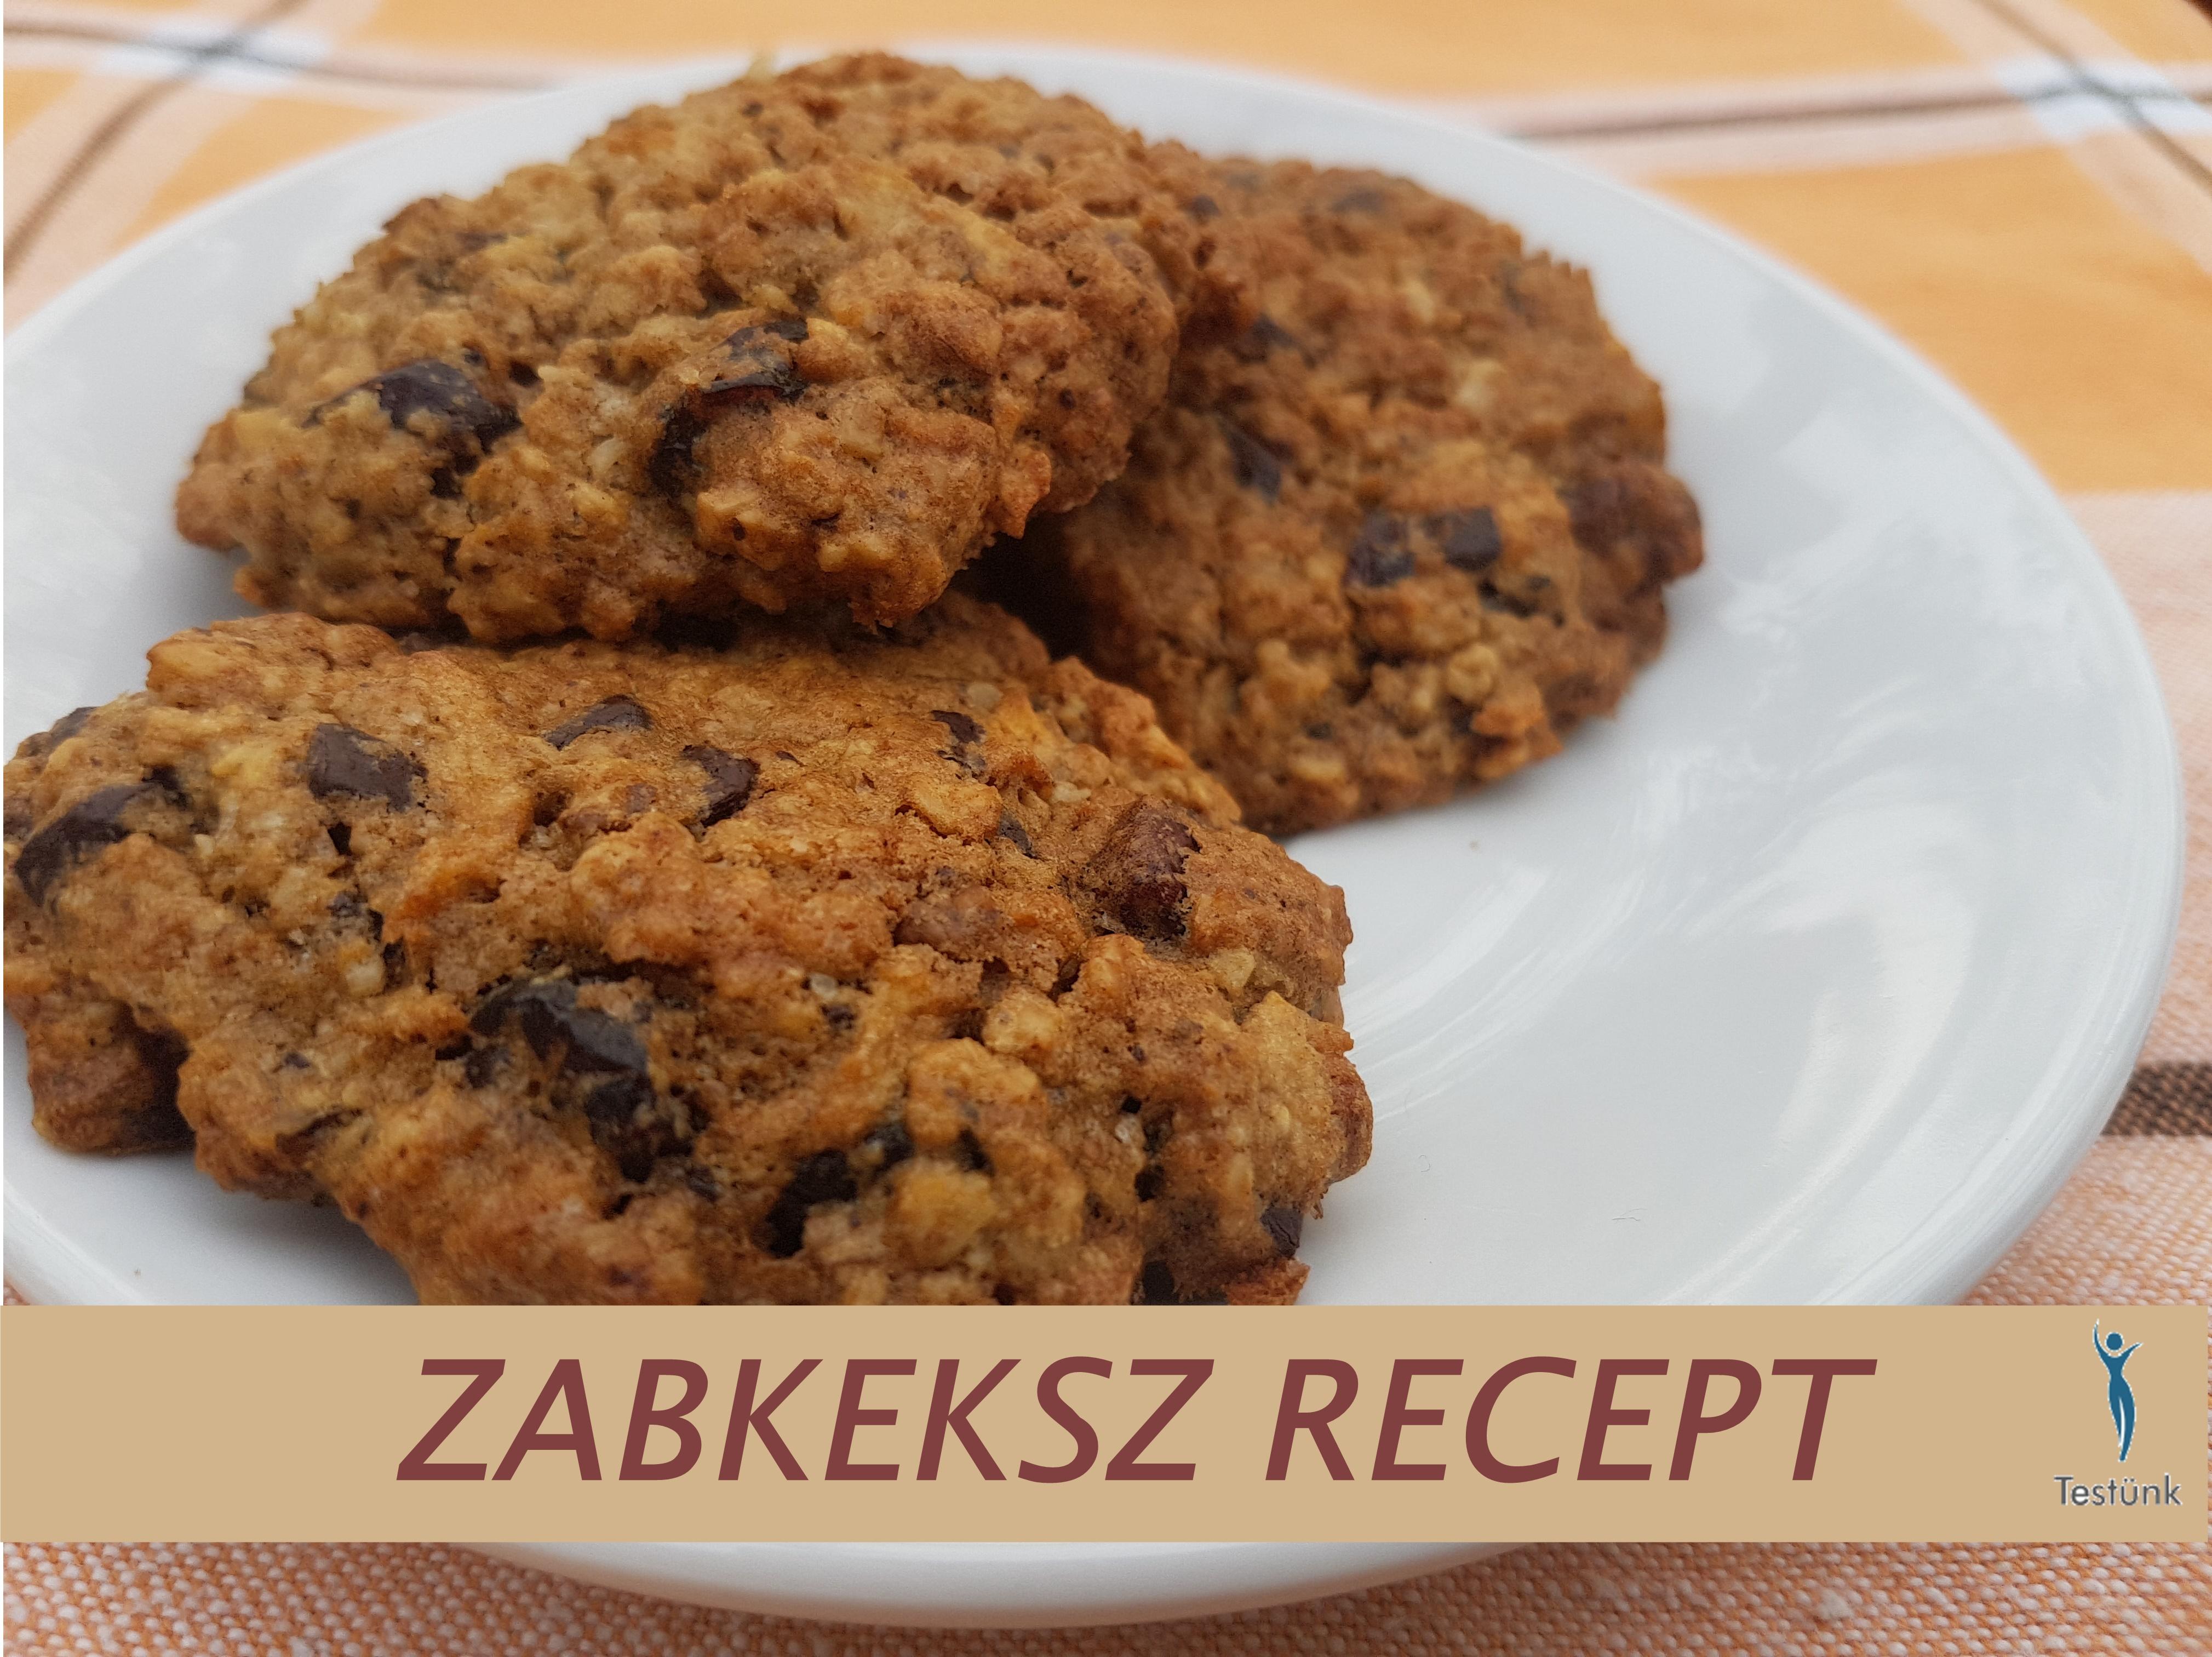 zabkeksz_recept.jpg